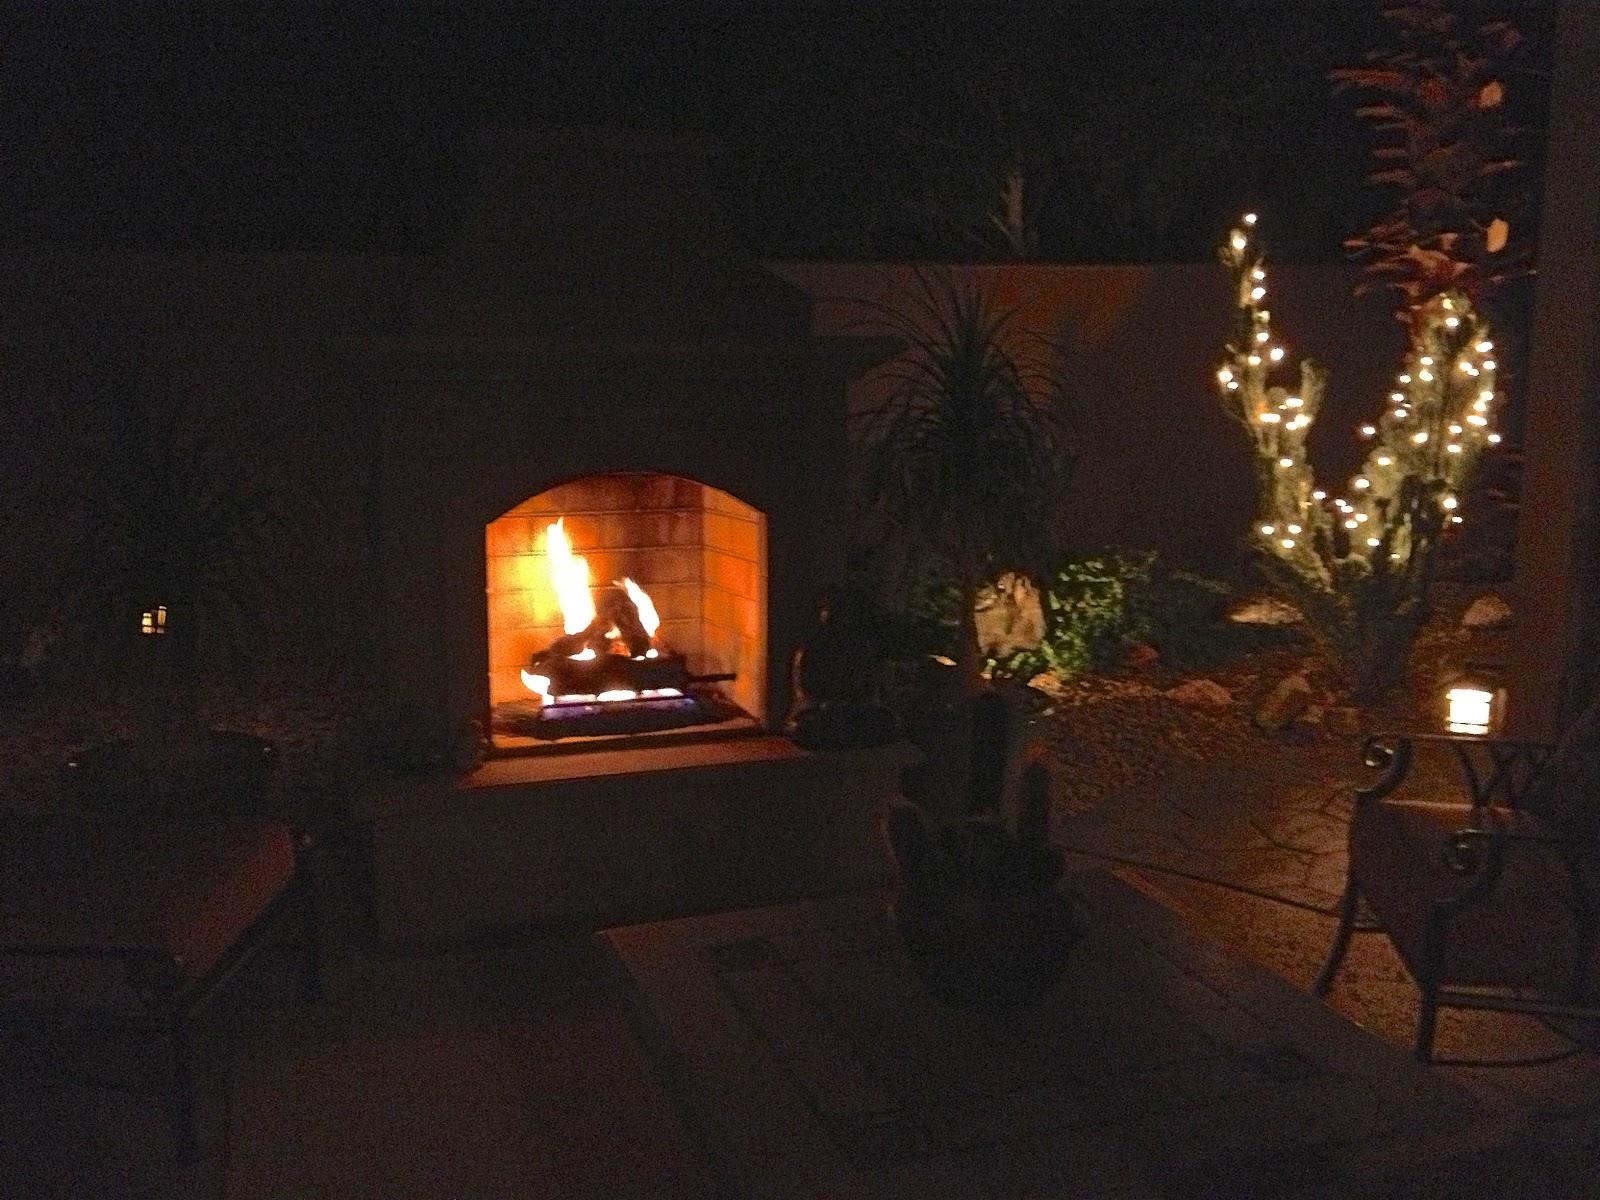 Evening Outdoor Fireplace Roaring Fire